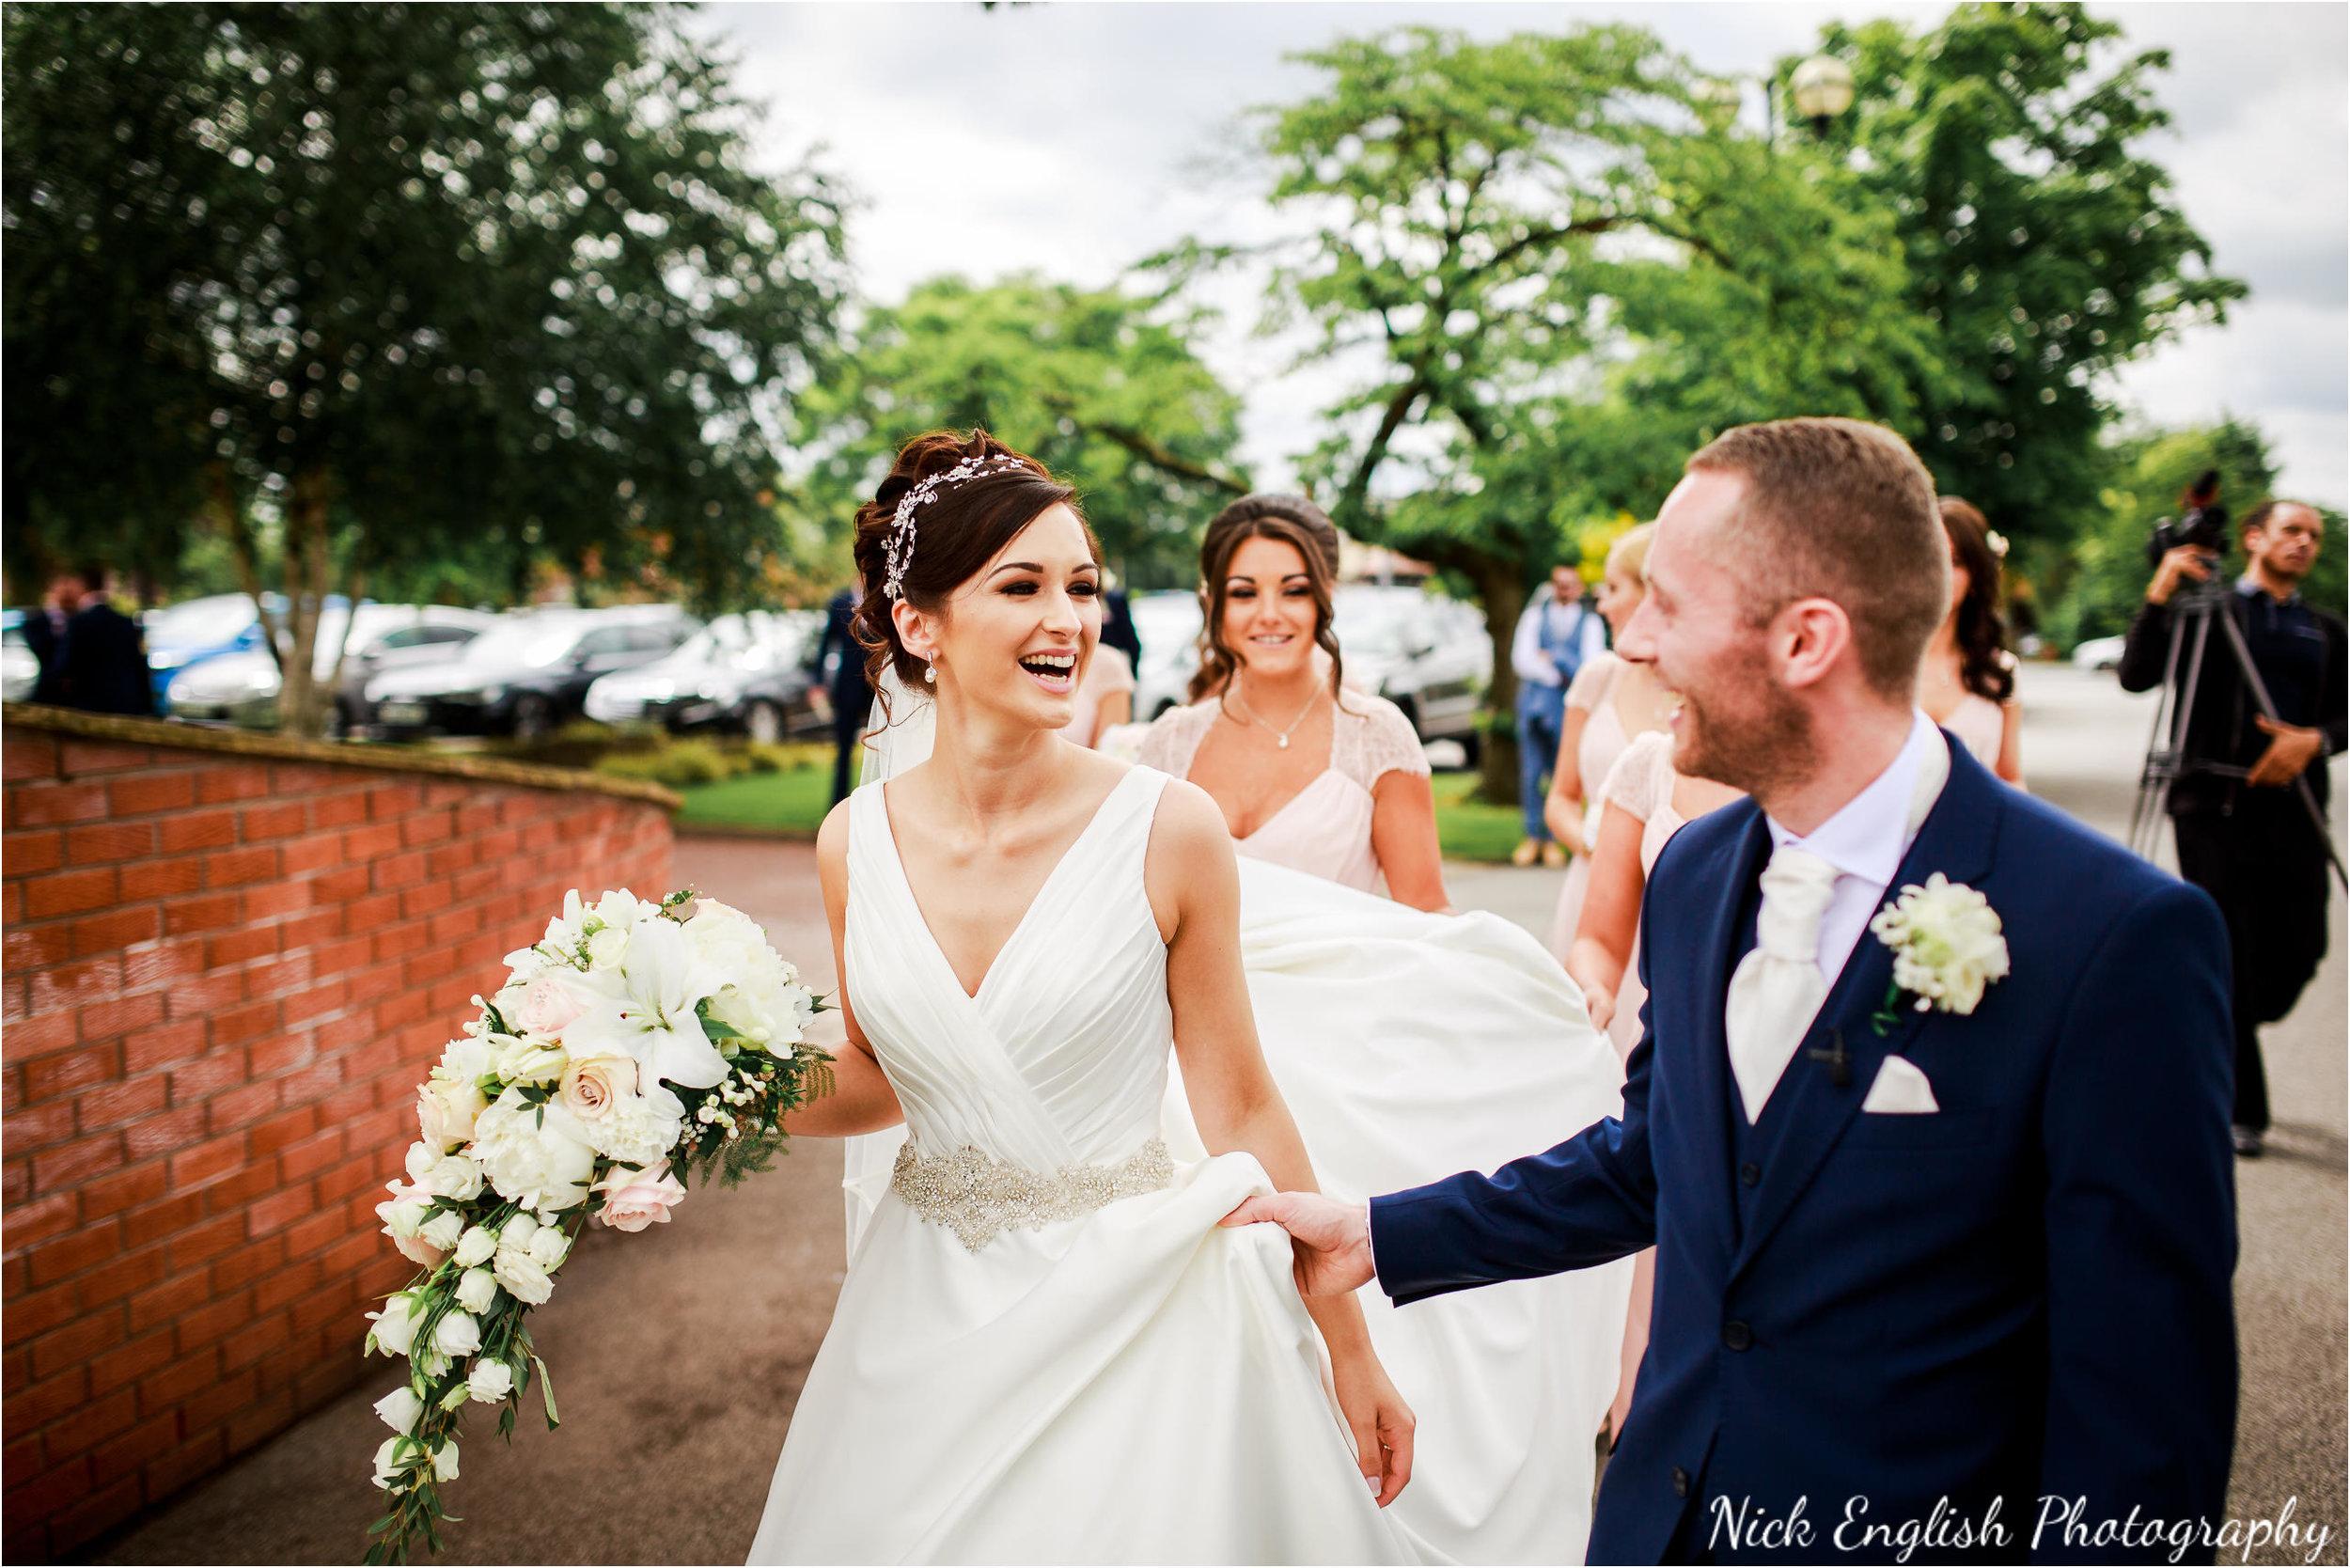 Emily David Wedding Photographs at Barton Grange Preston by Nick English Photography 86jpg.jpeg